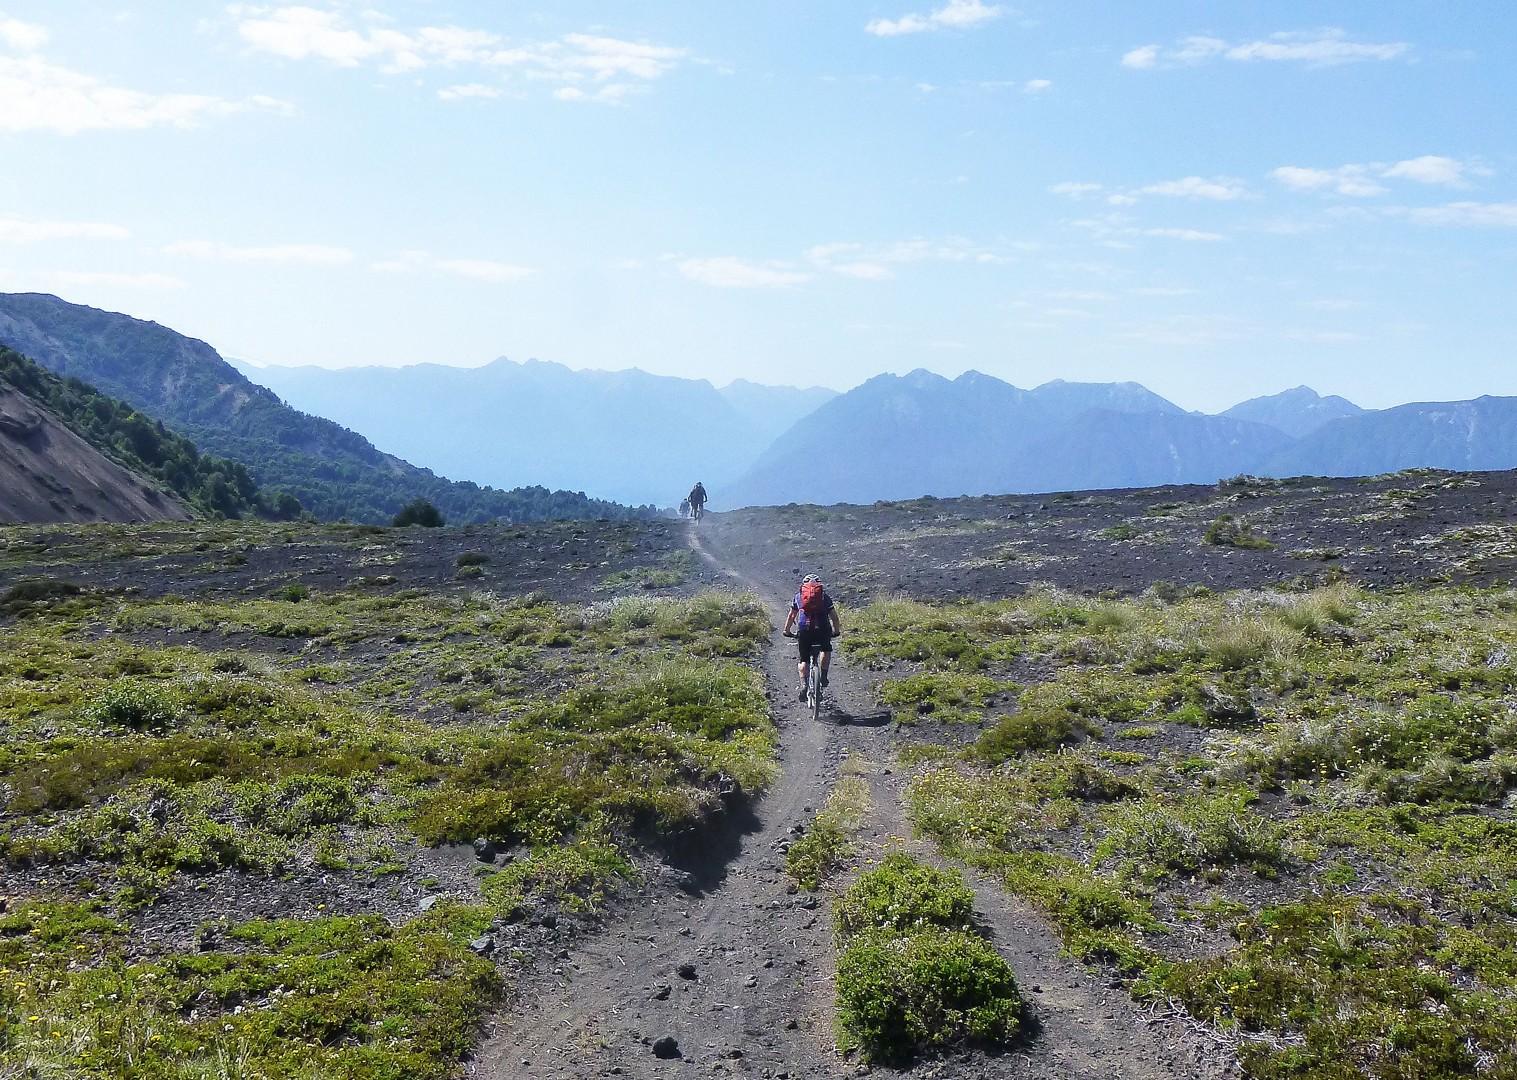 P1040030.JPG - Chile and Argentina - Wild Patagonia - Mountain Biking